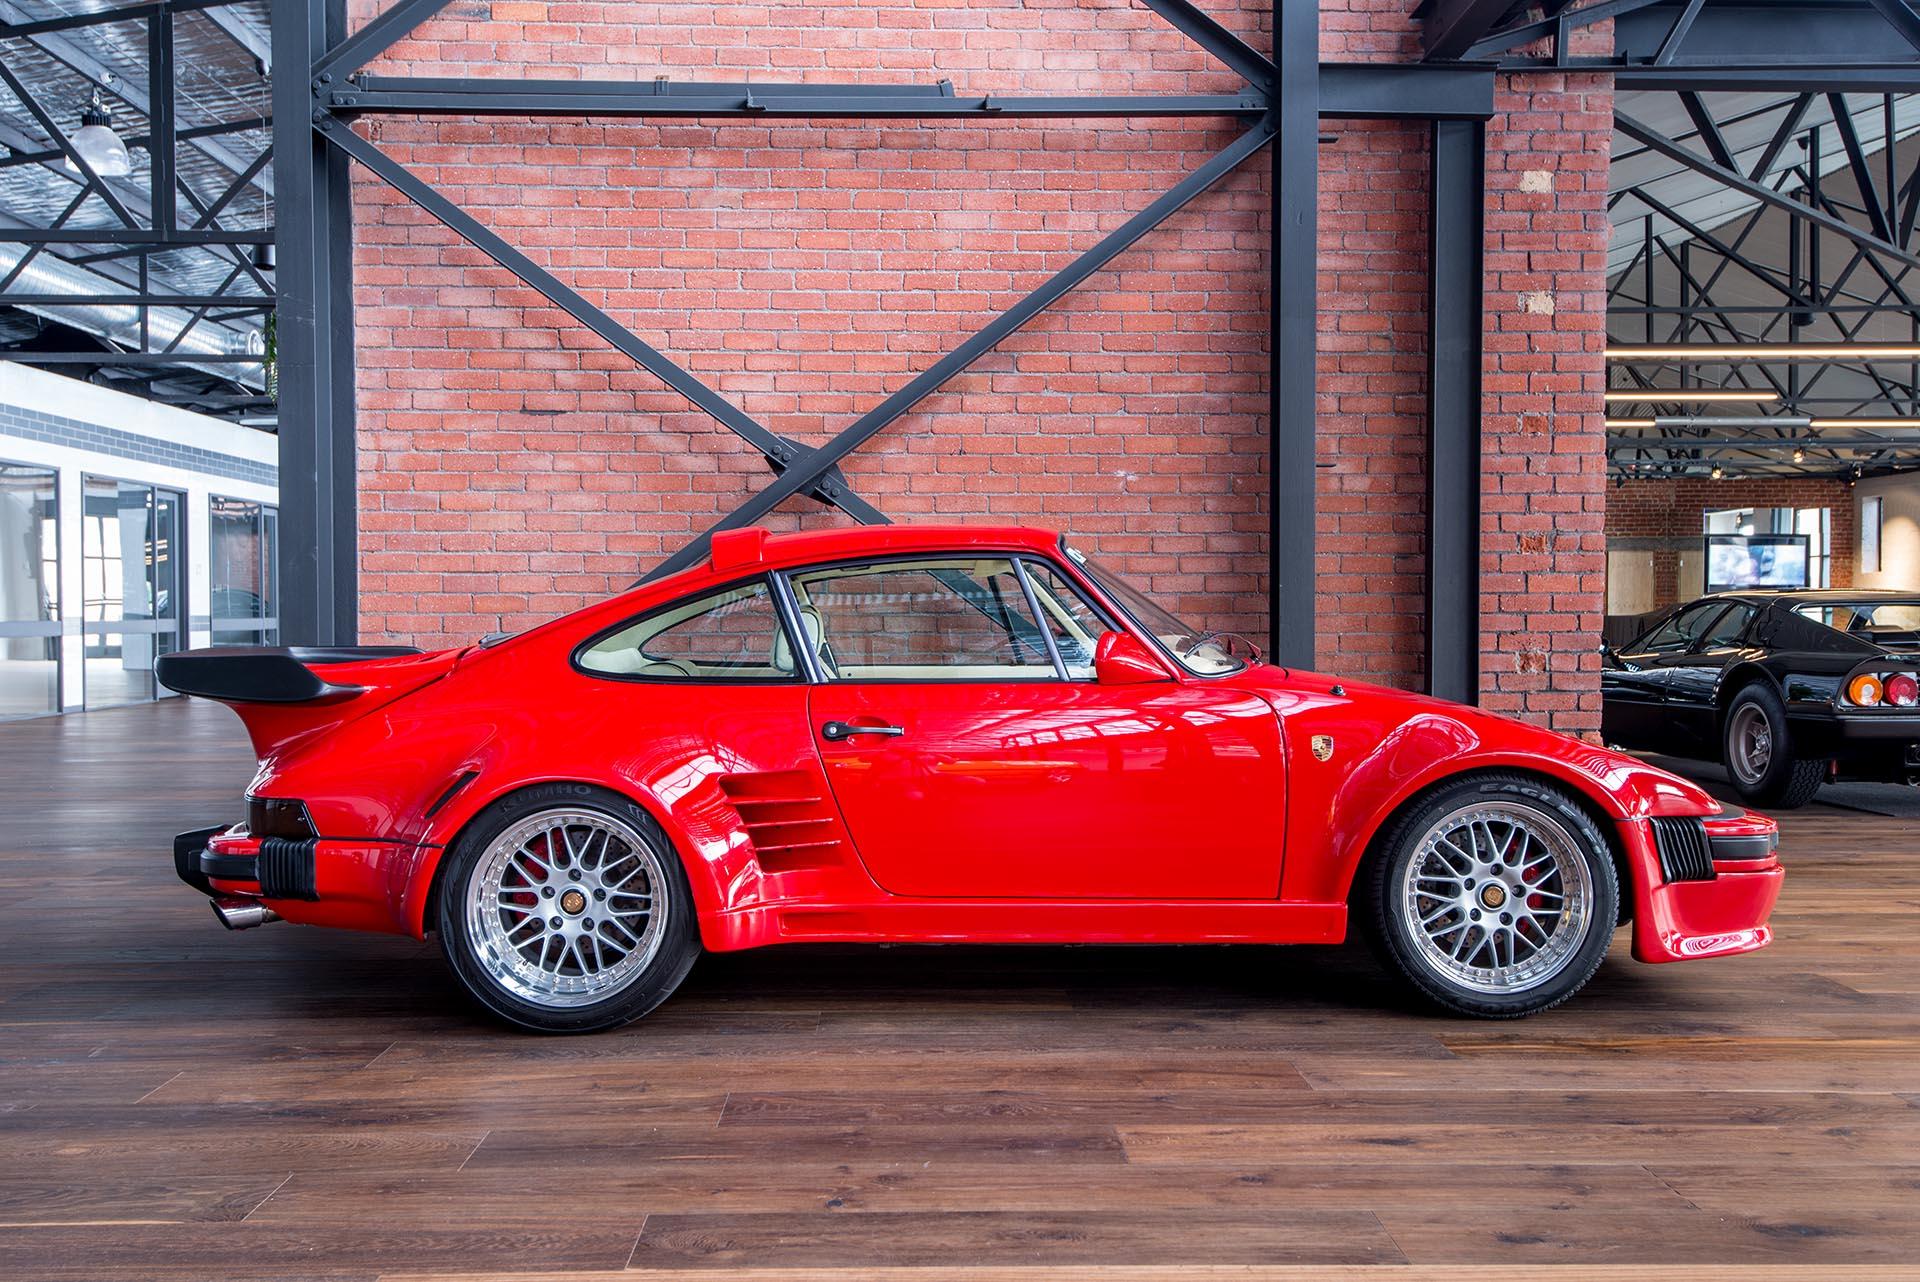 1978 Porsche Kremer Turbo For Sale - Richmonds Classic ...